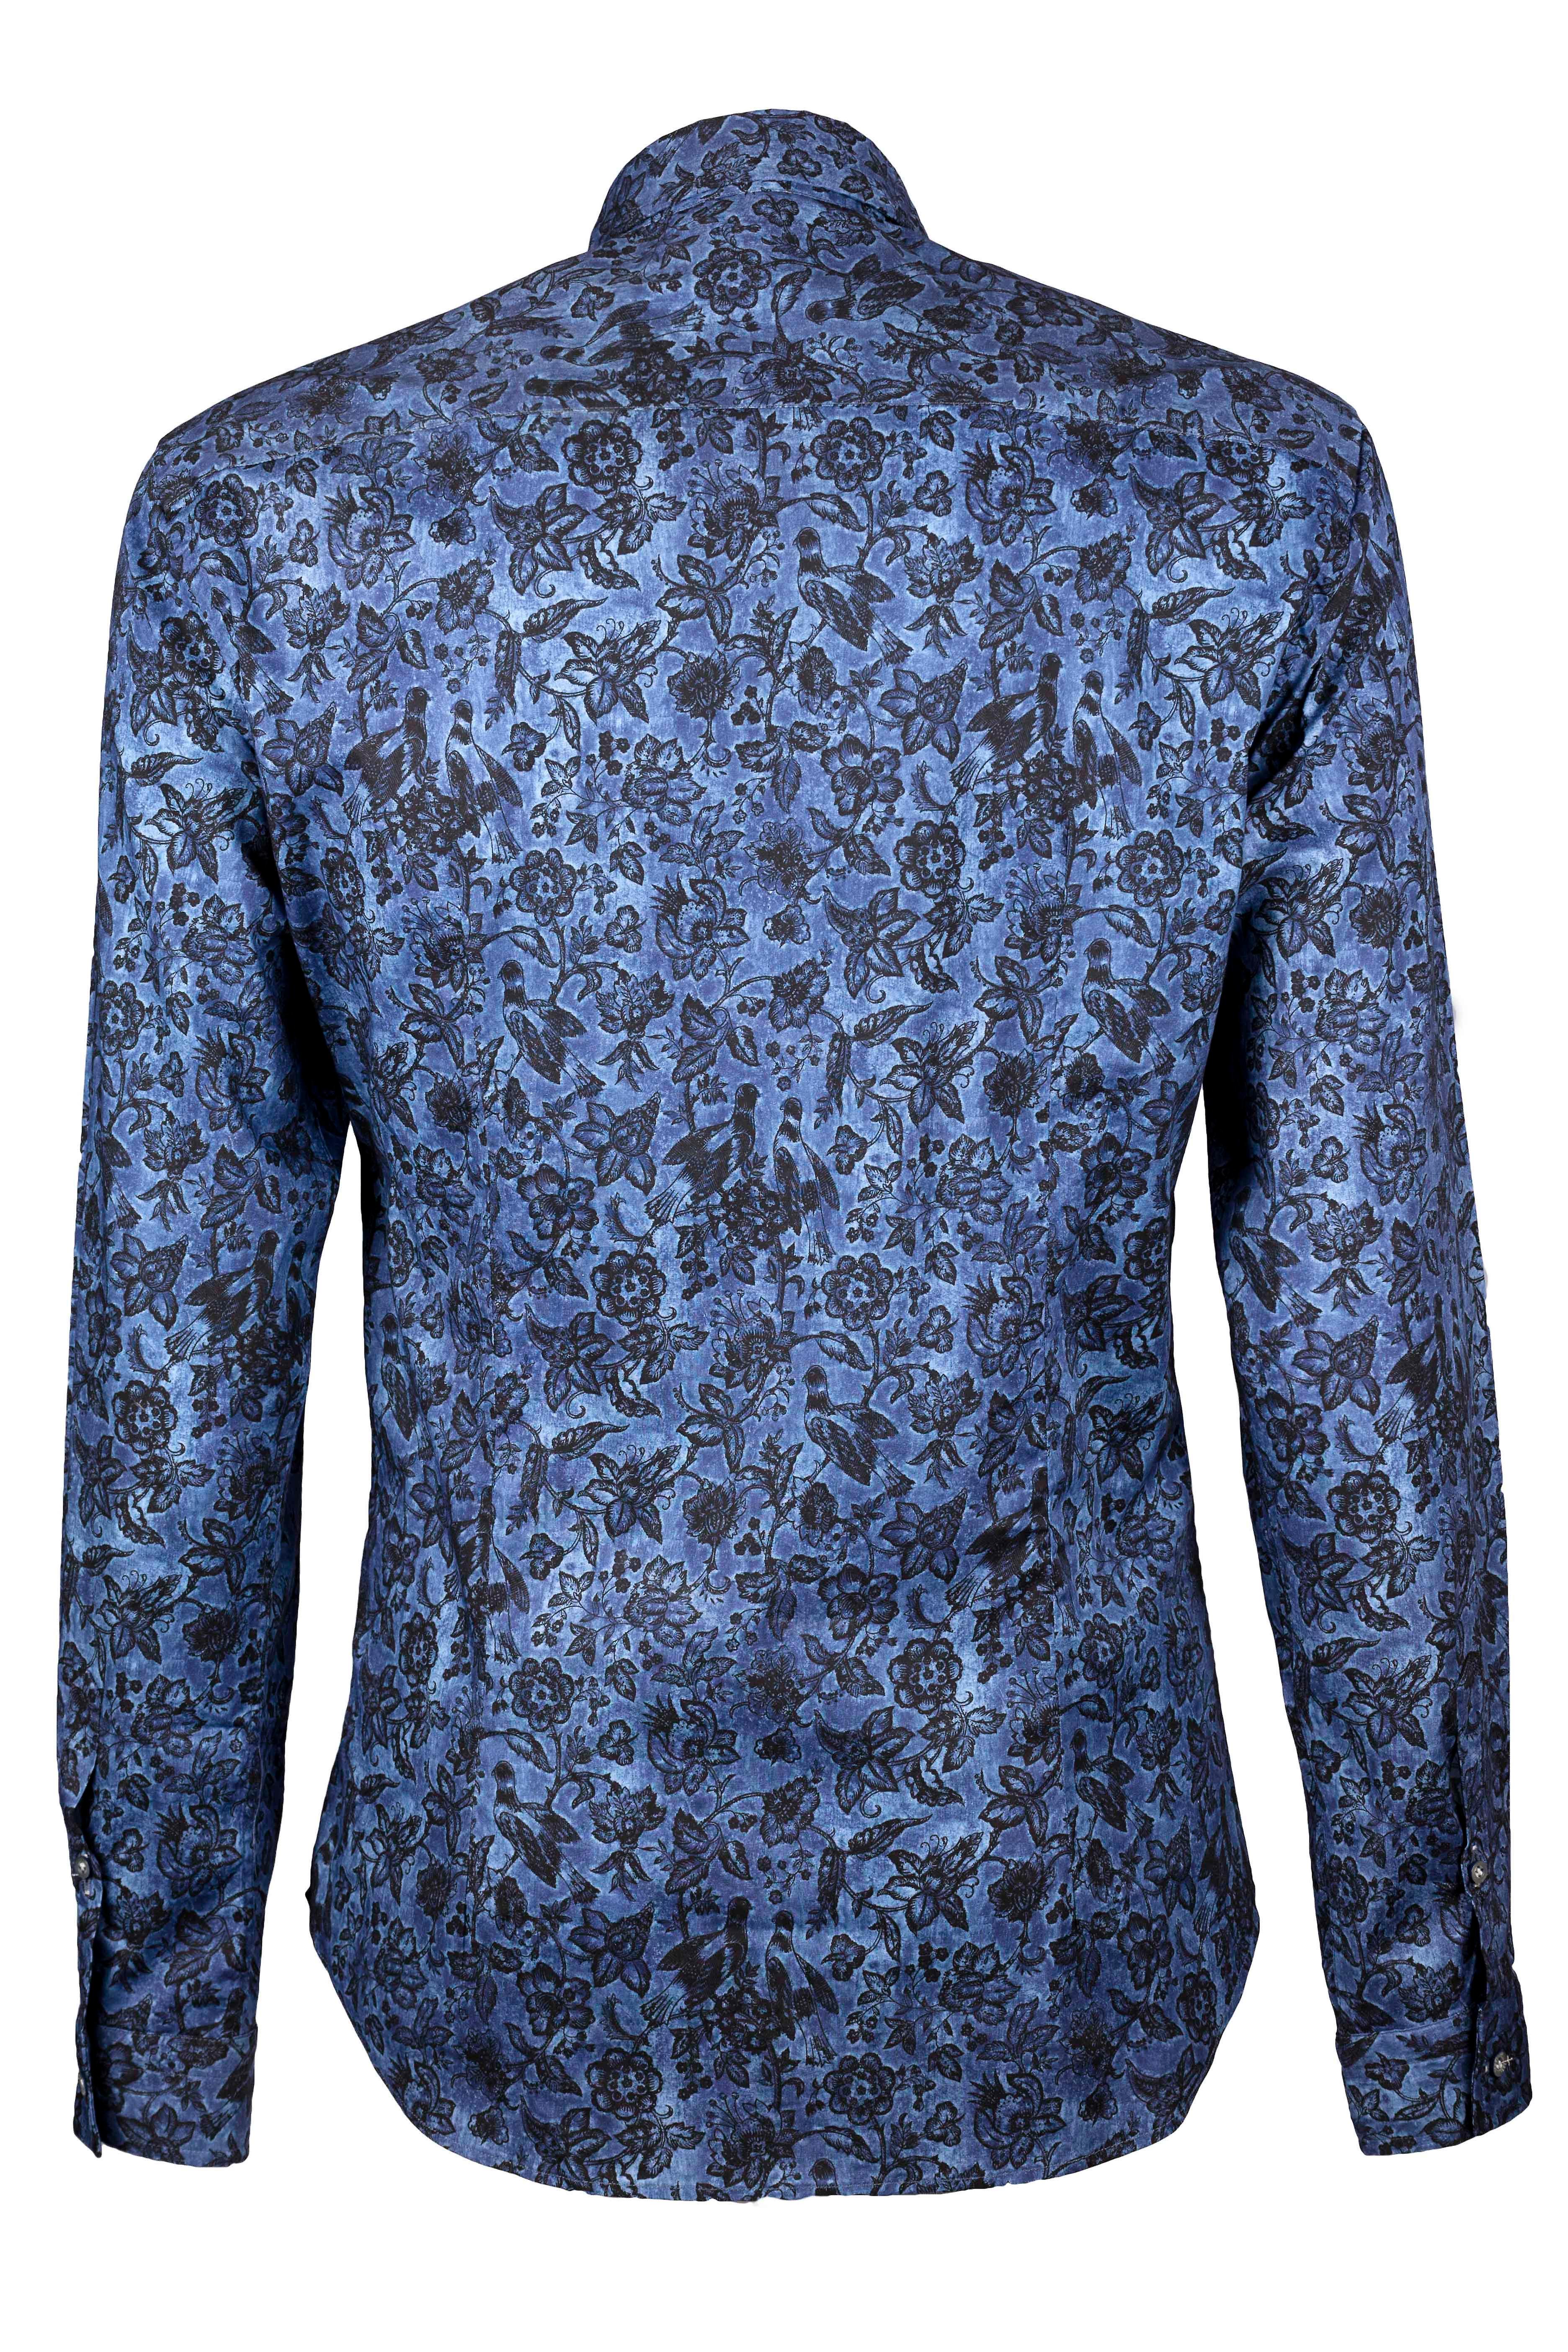 Fabio Giovanni Fucito Shirt - Mens Italian Floral Casual Shirt - Long Sleeve